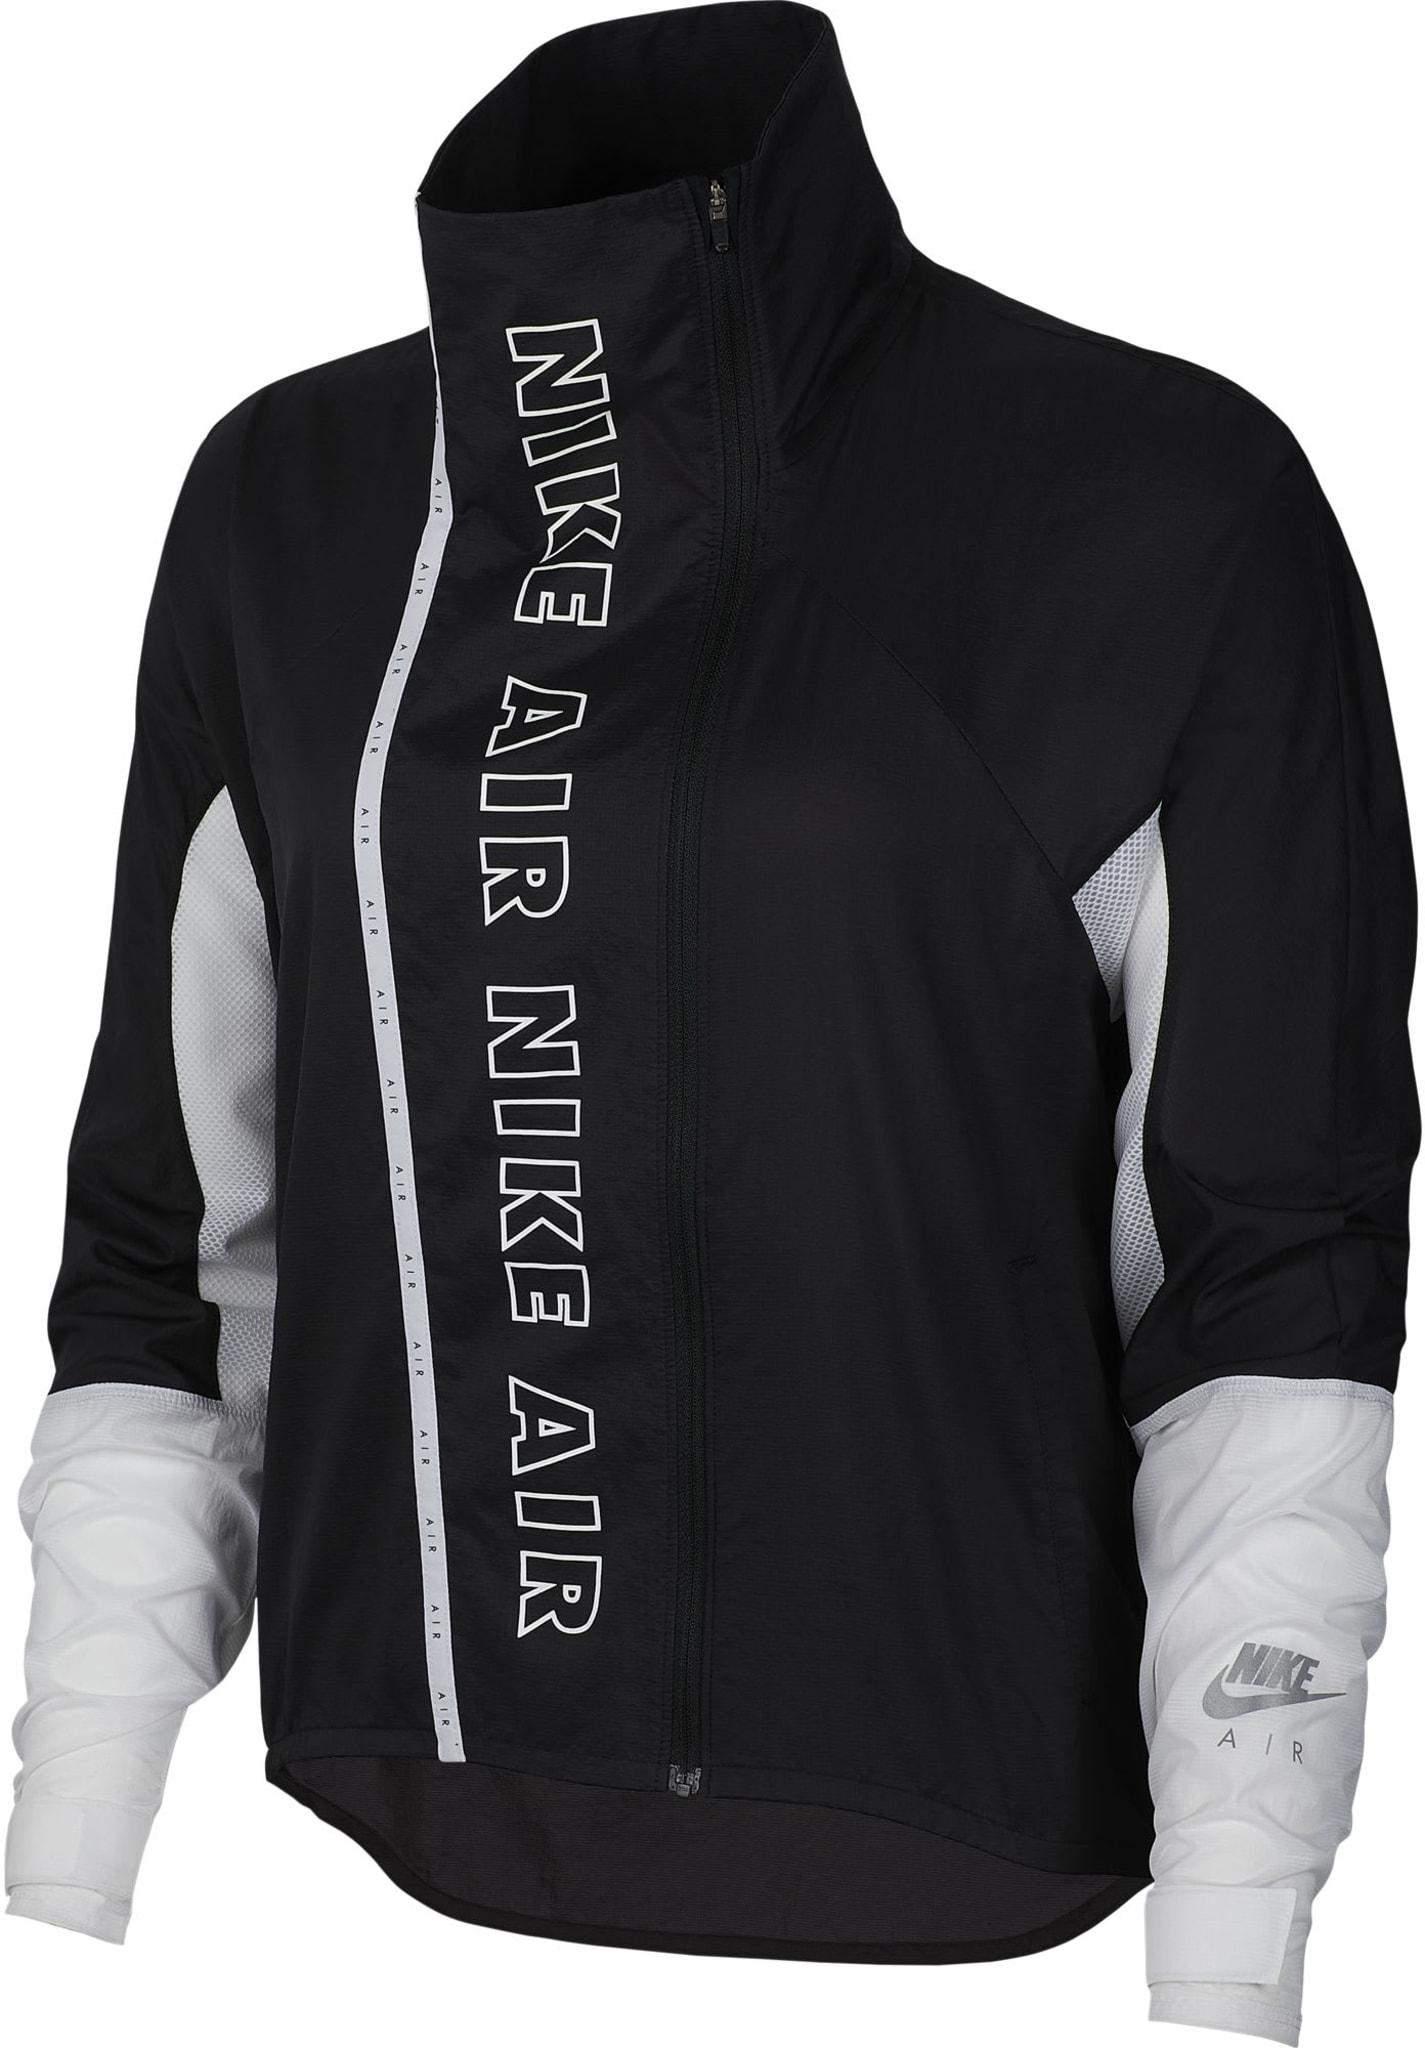 Air Full-Zip Runnin Jacket W